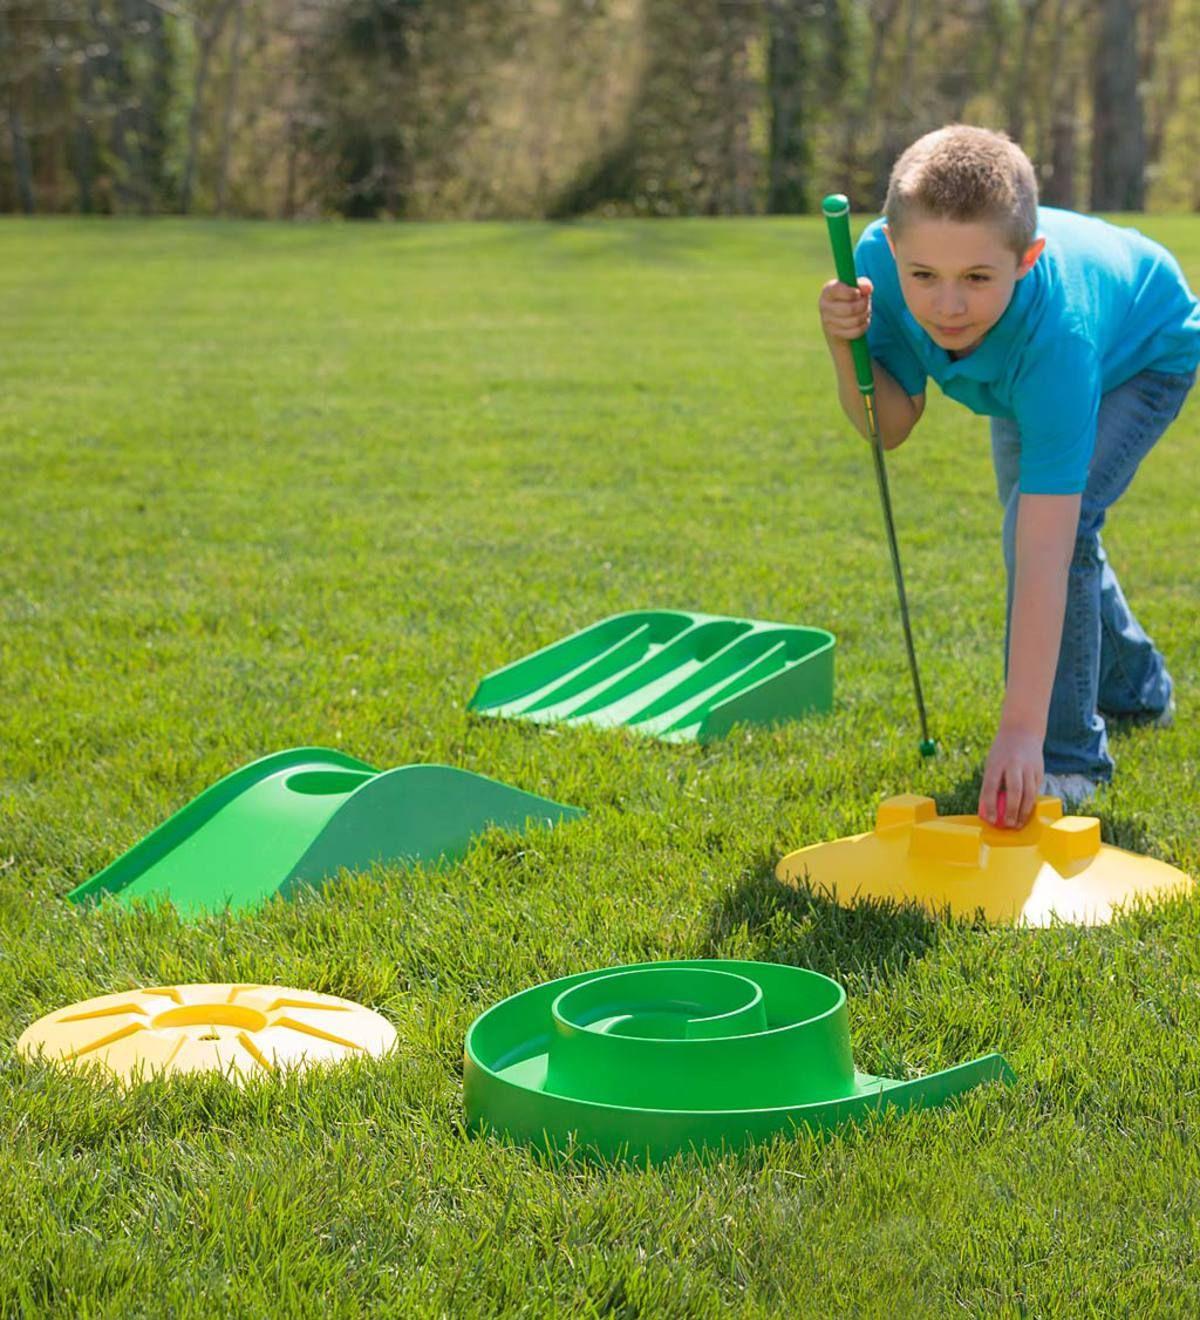 Mini Golf Set Hearthsong In 2021 Mini Golf Course Mini Golf Mini Golf Set Backyard mini golf kit